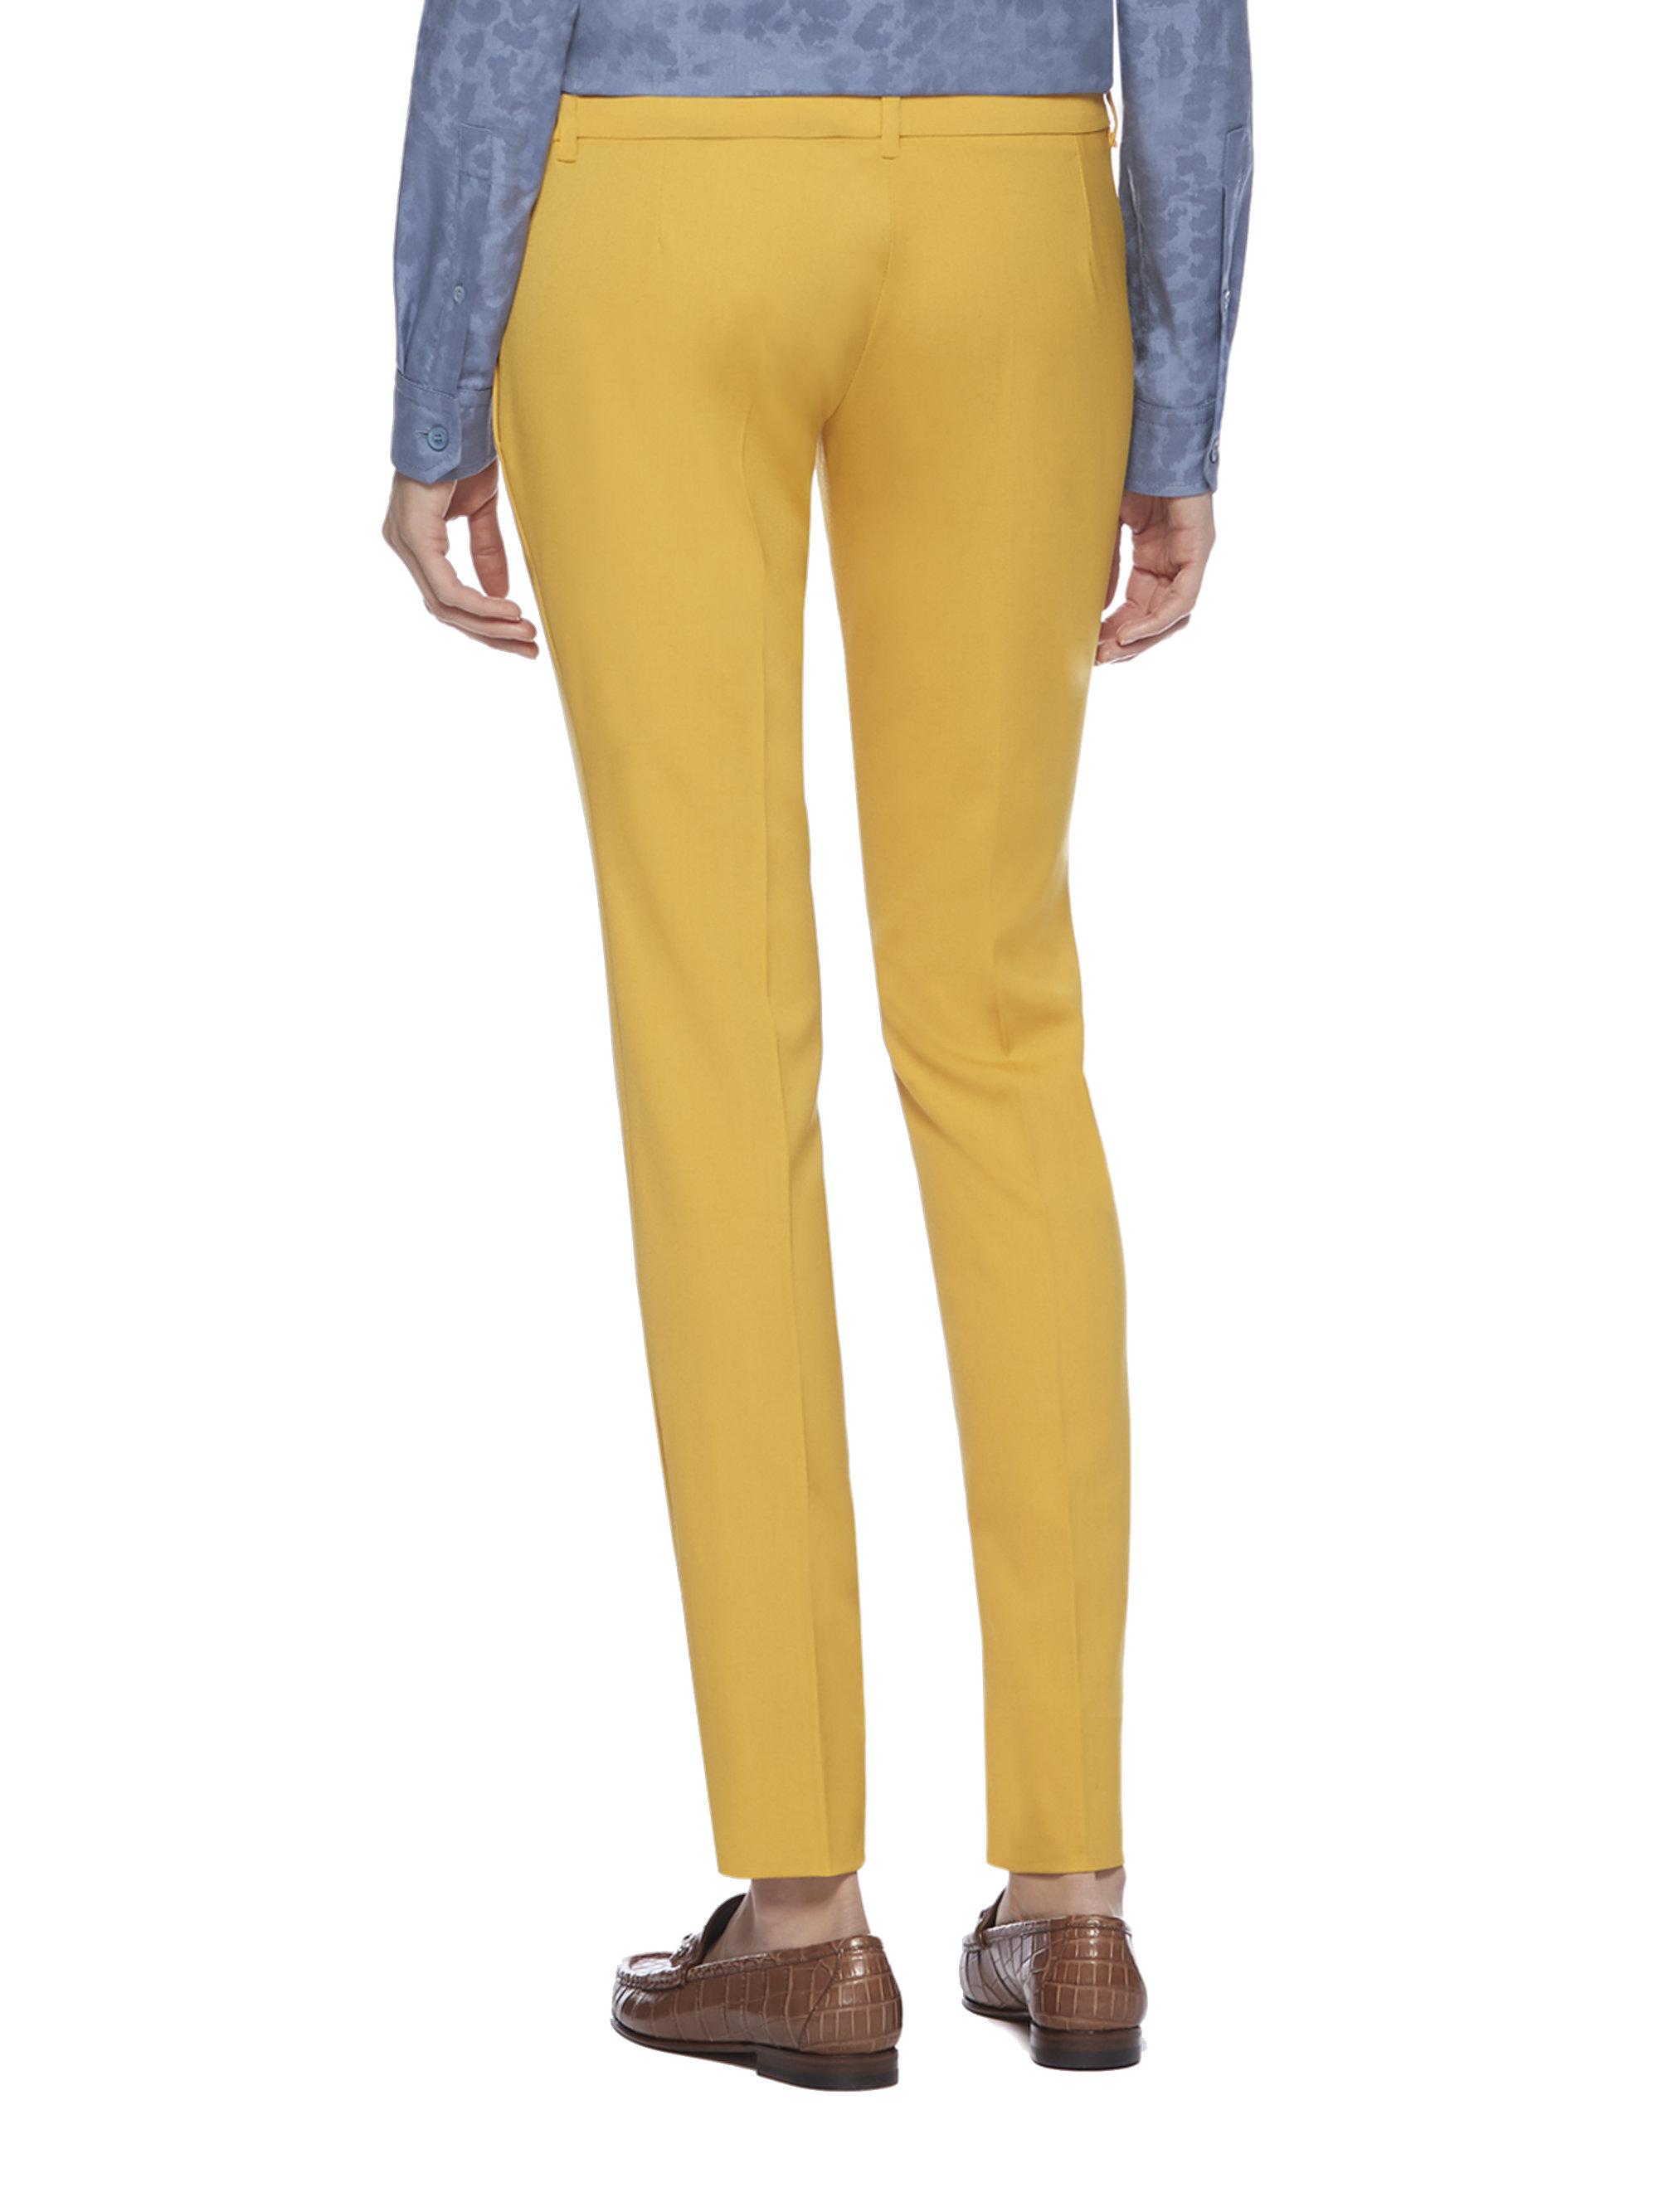 Women's Mustard Pants